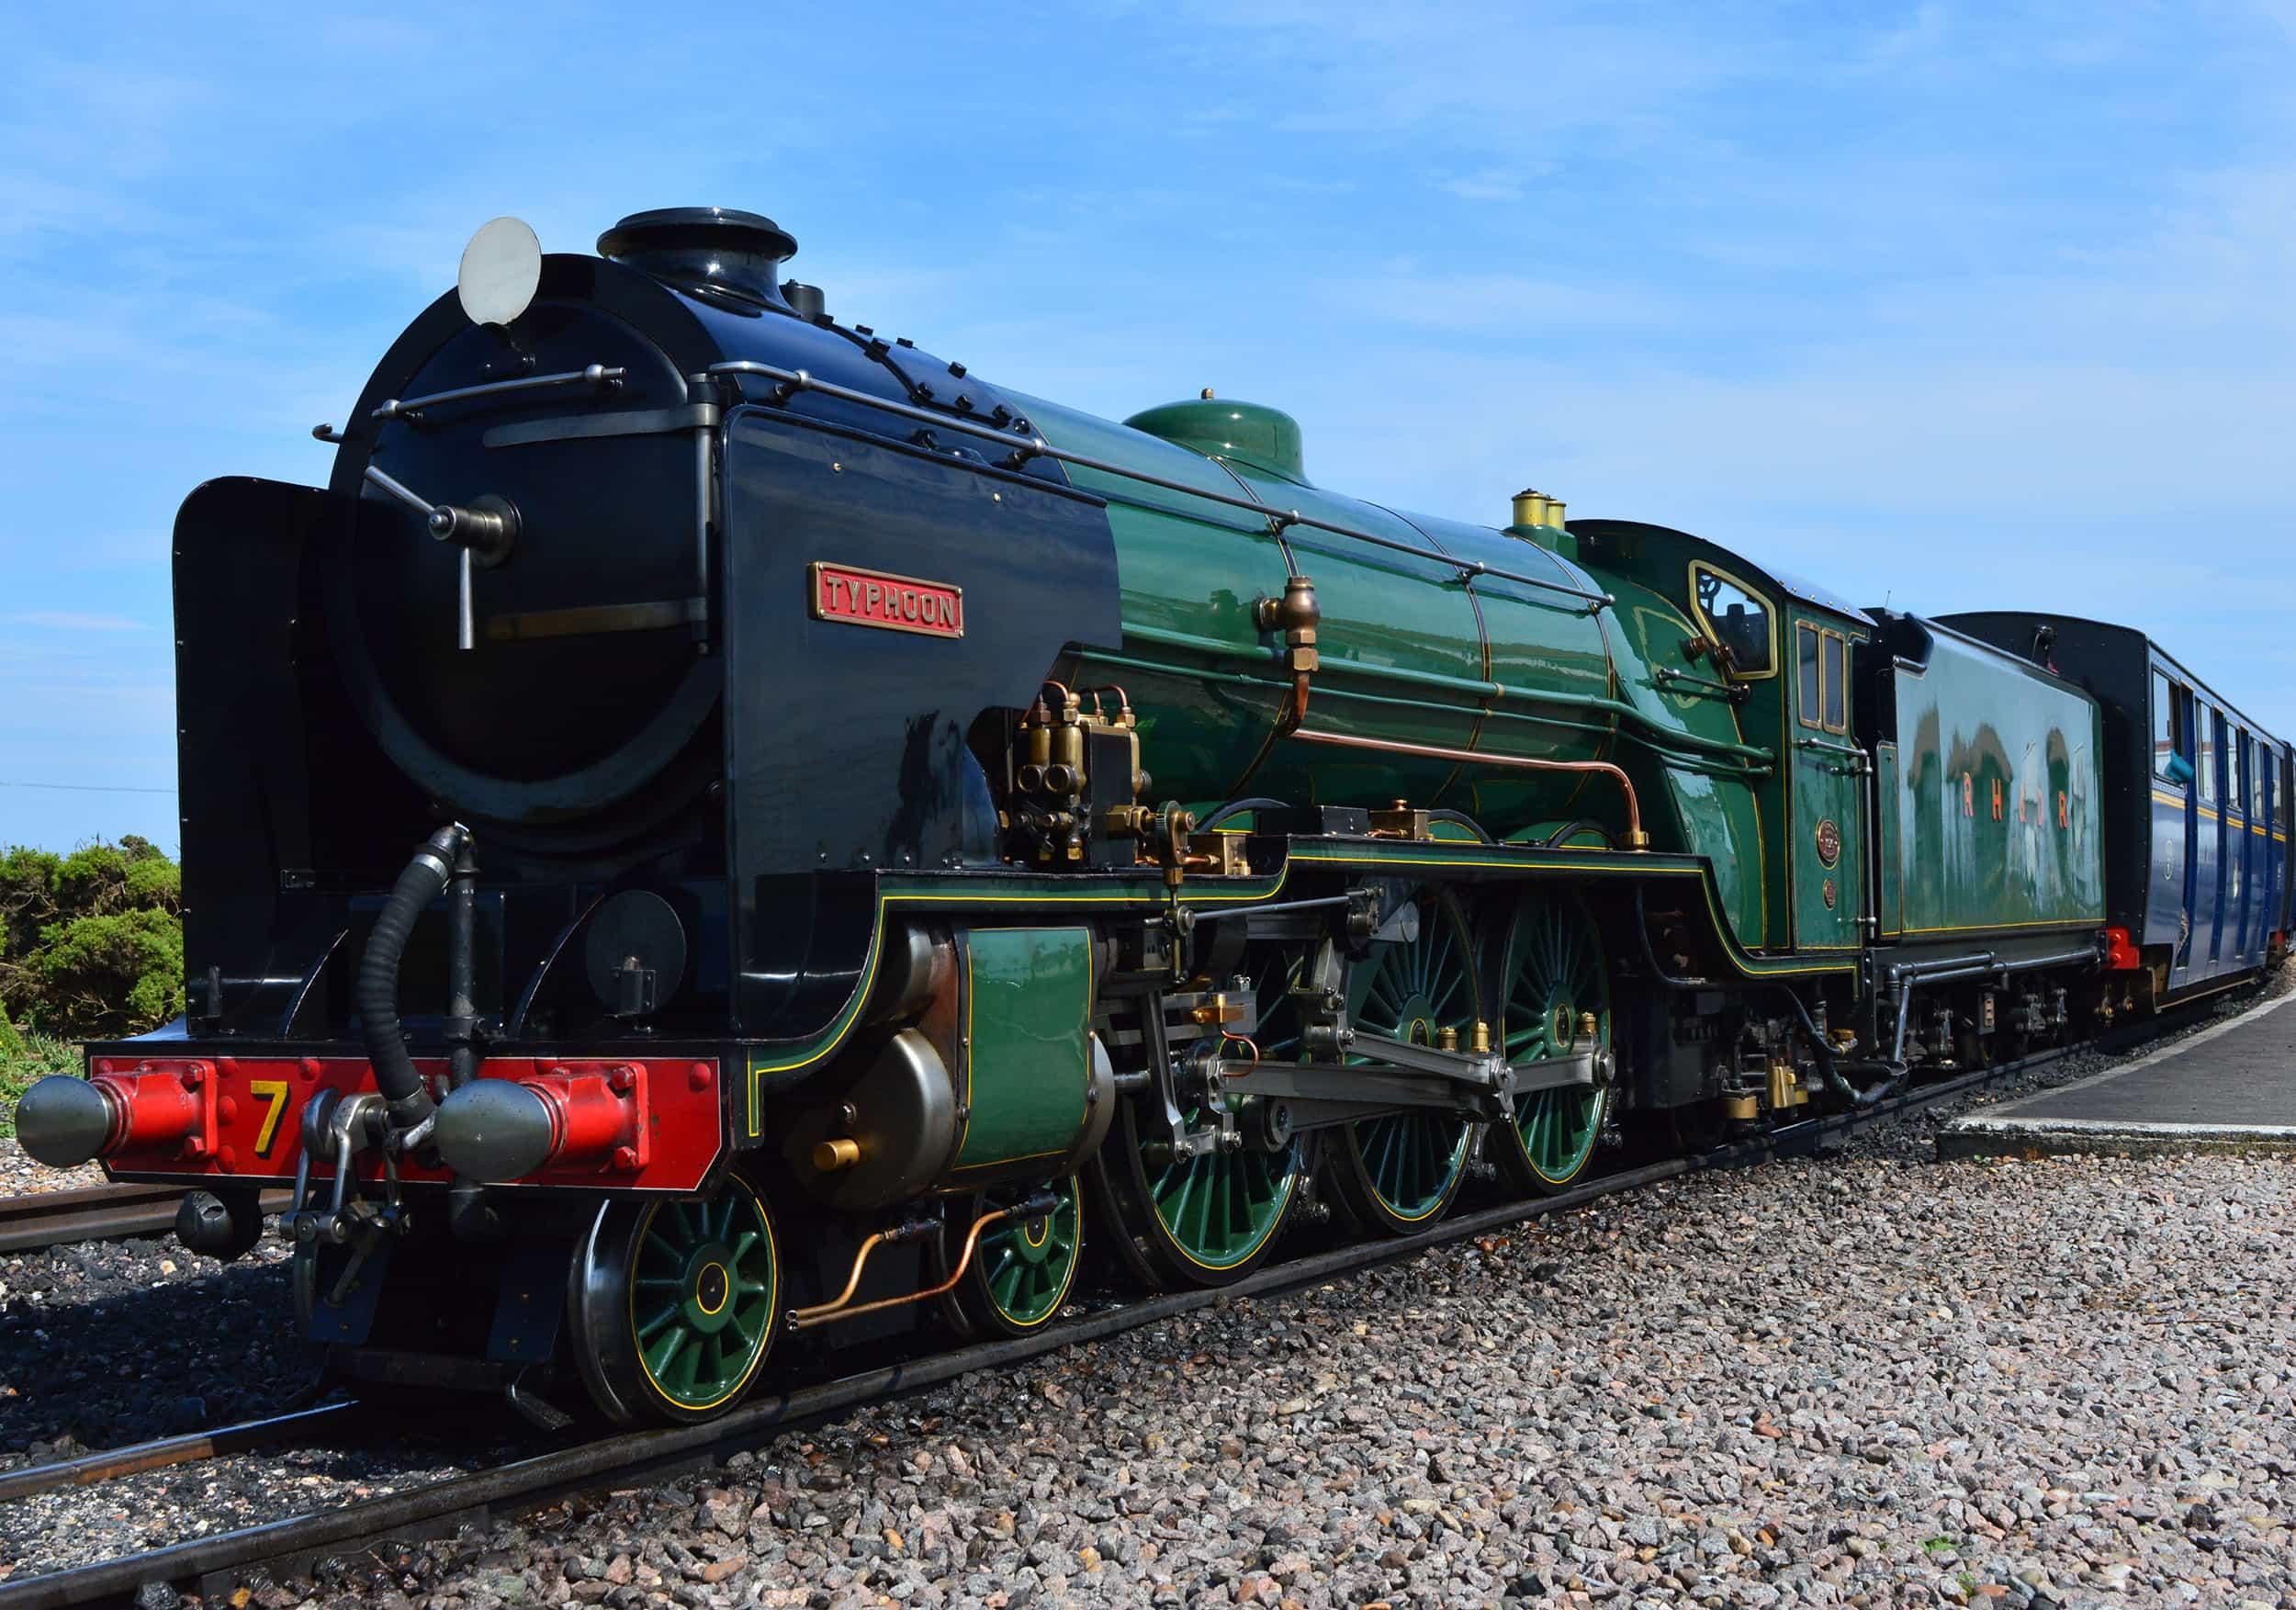 Typhoon - Romney, Hythe & Dymchurch Railway